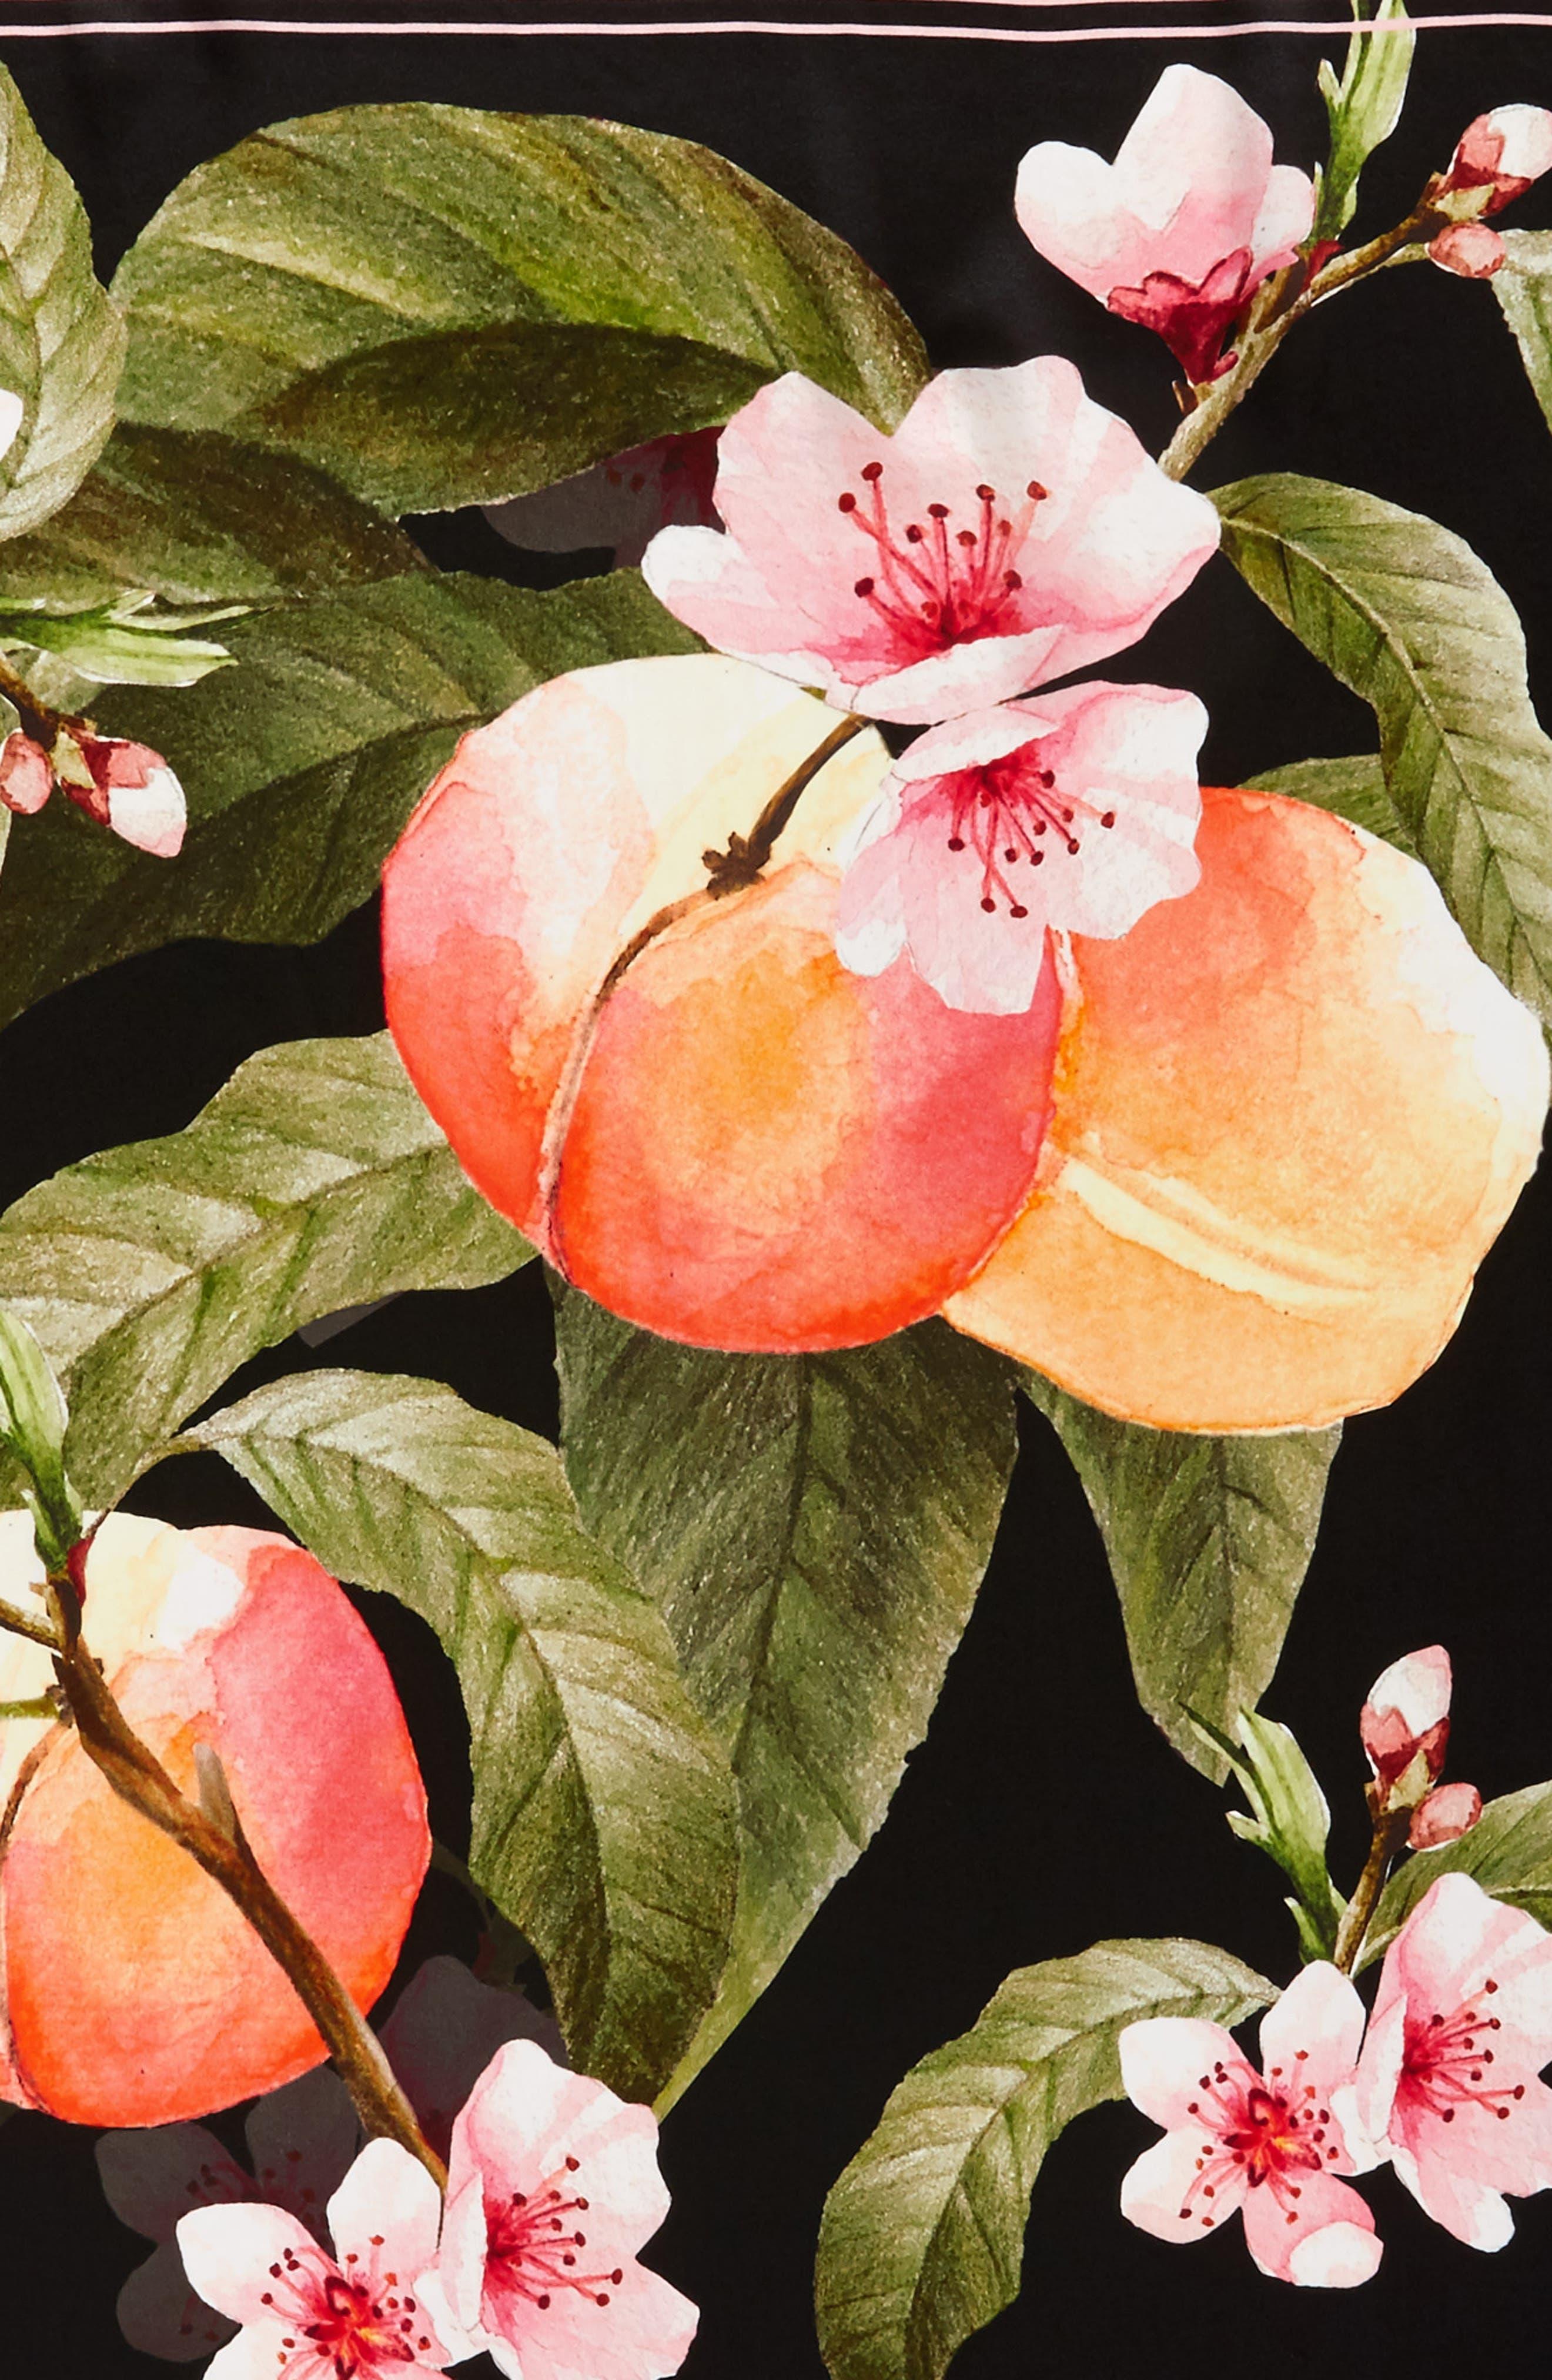 Peach Blossom Square Silk Scarf,                             Alternate thumbnail 4, color,                             00-Black